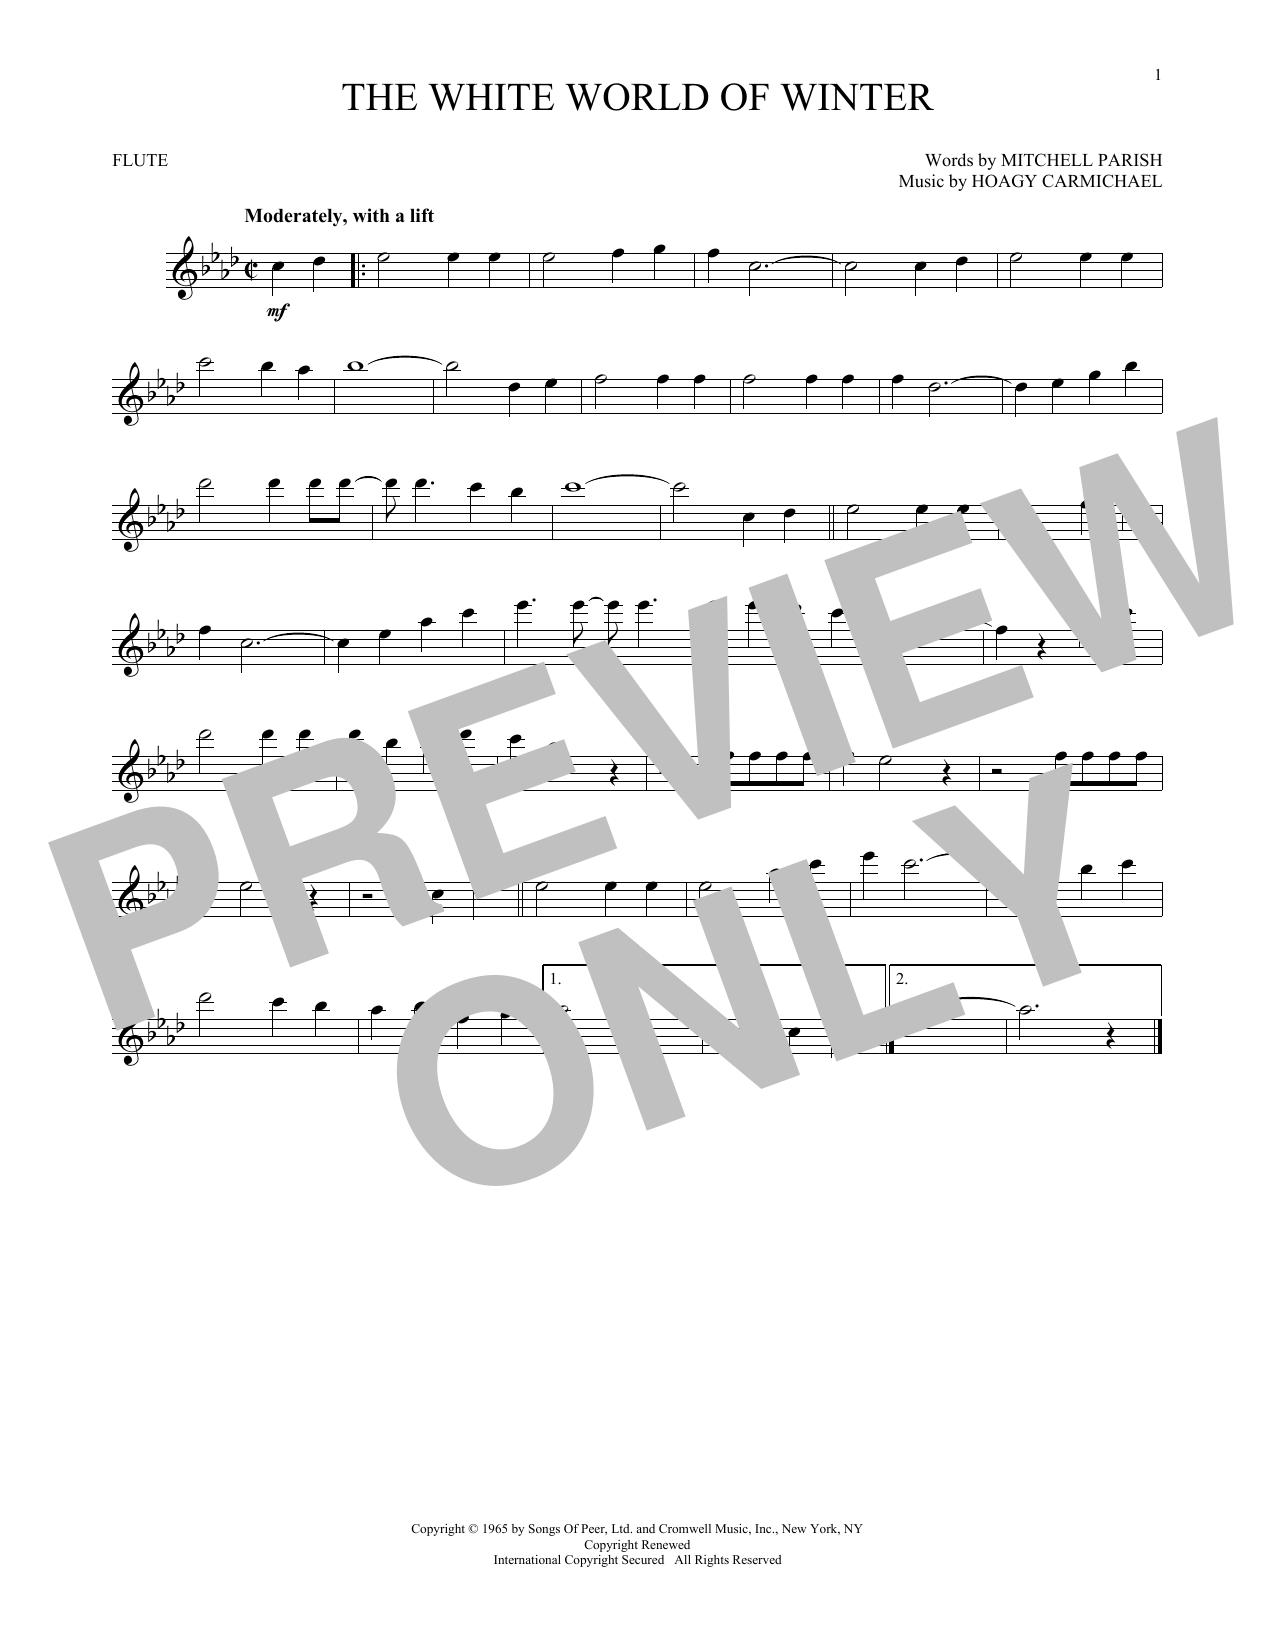 The White World Of Winter (Flute Solo)